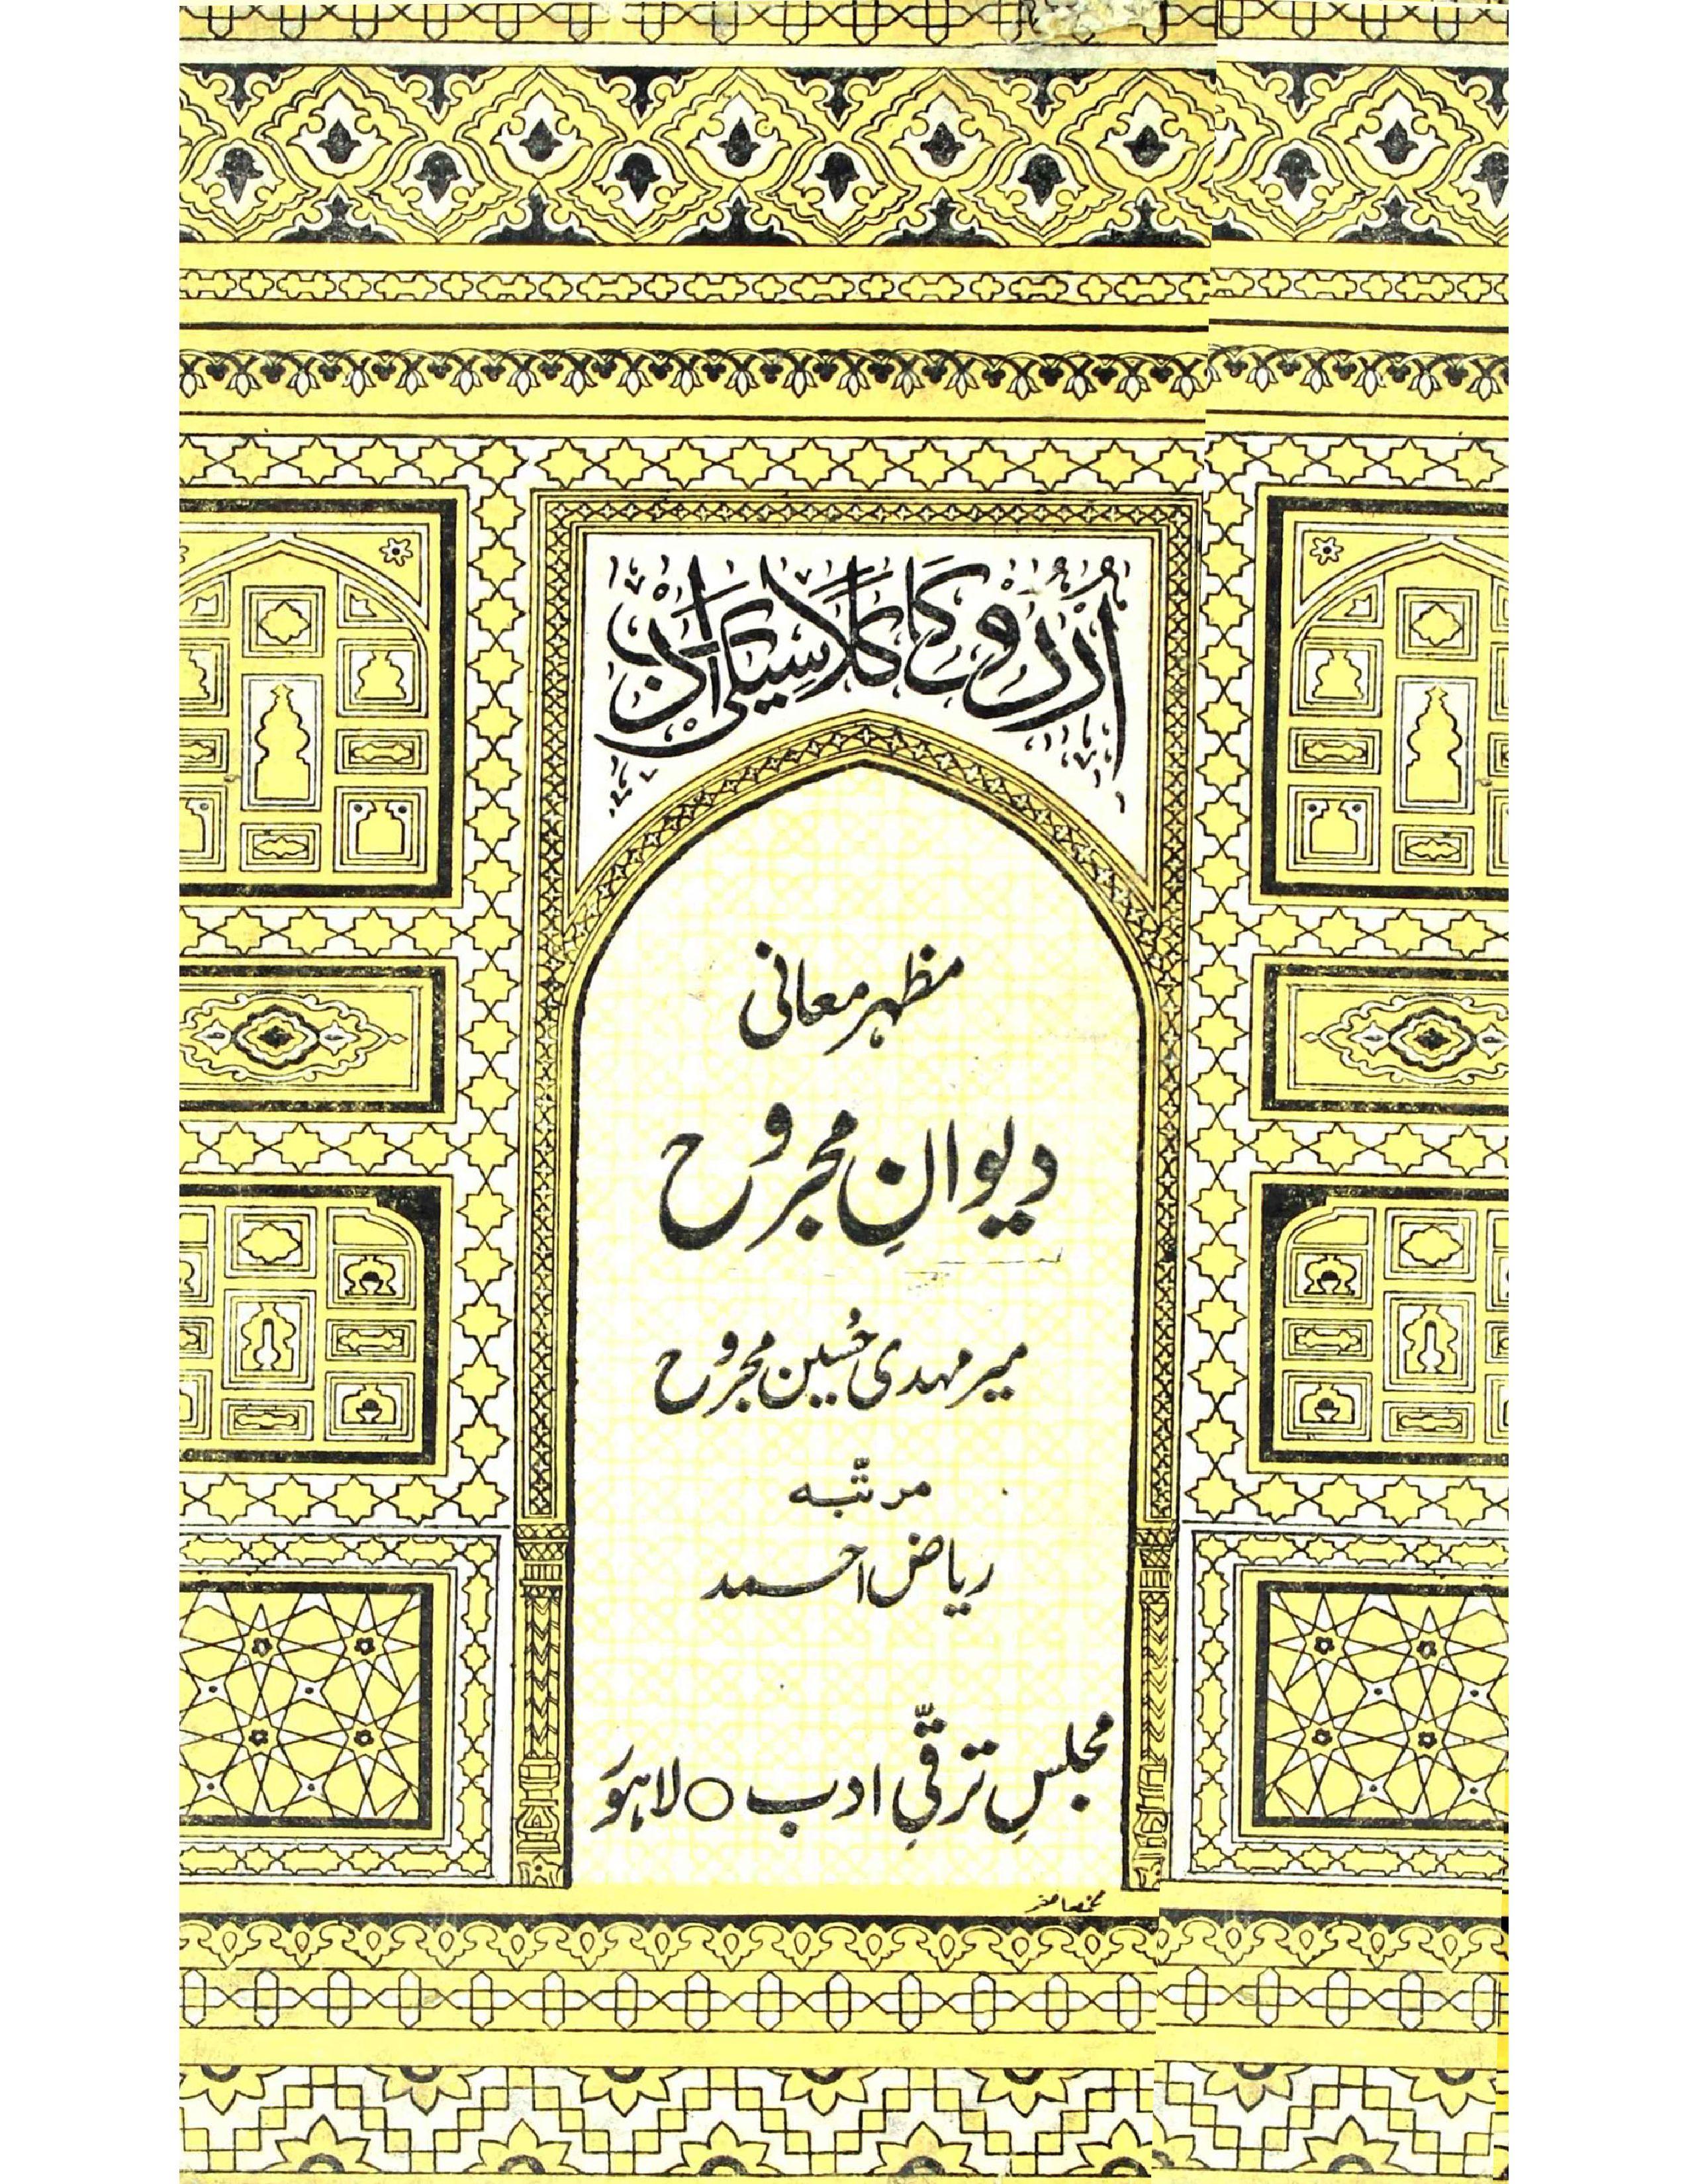 Deewan-e-Majrooh